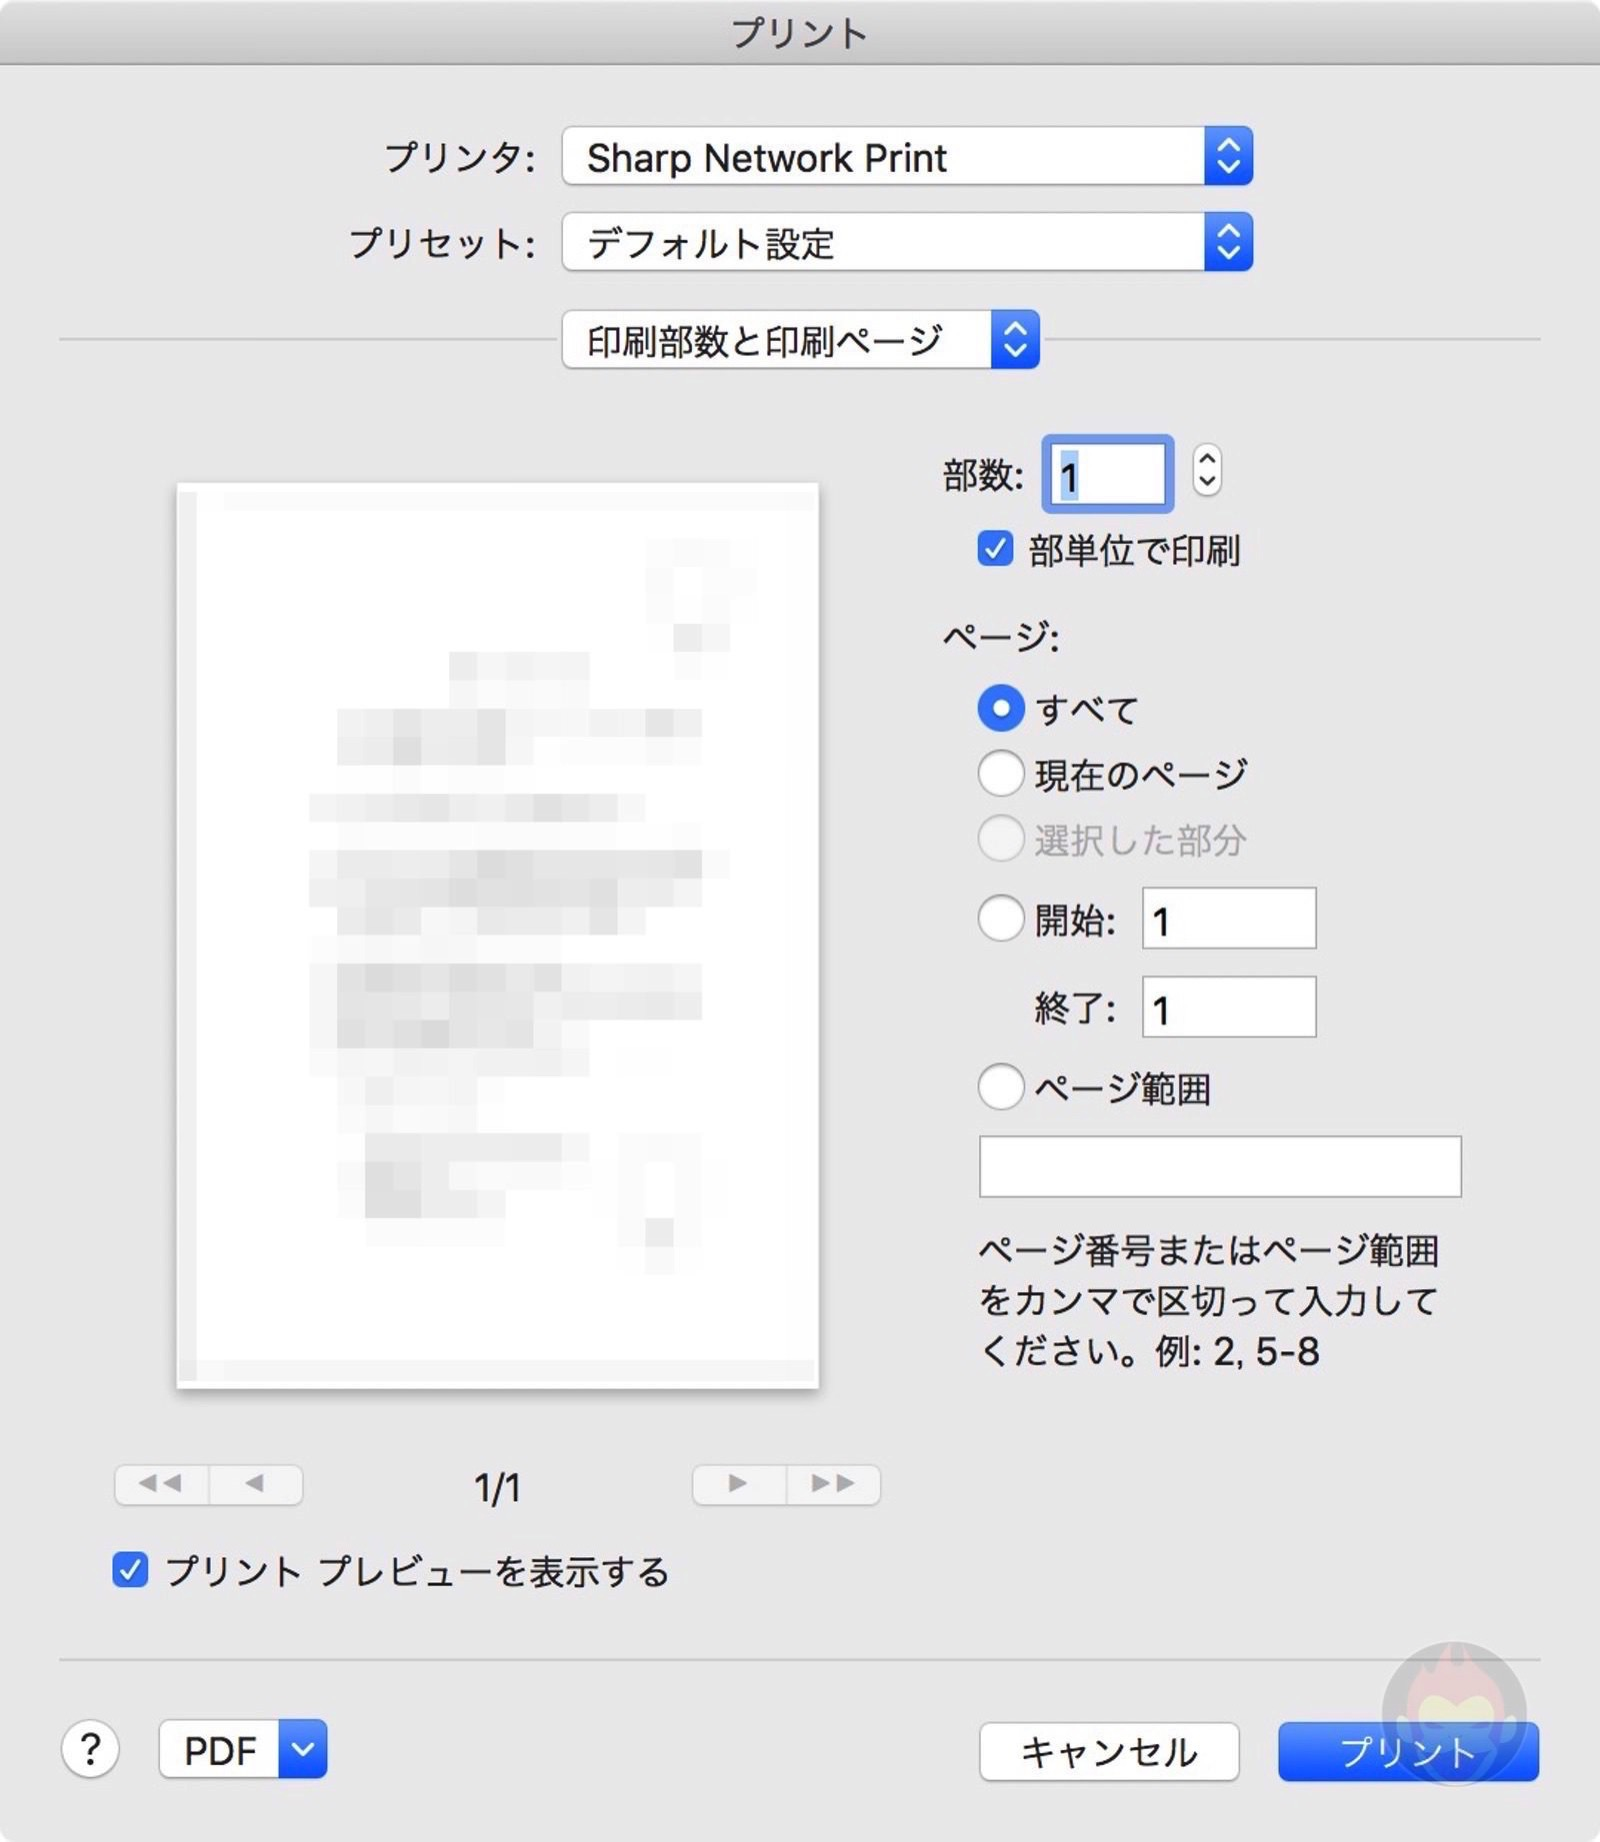 Printing-Files-directly-from-mac-printer-settings-03-2.jpg